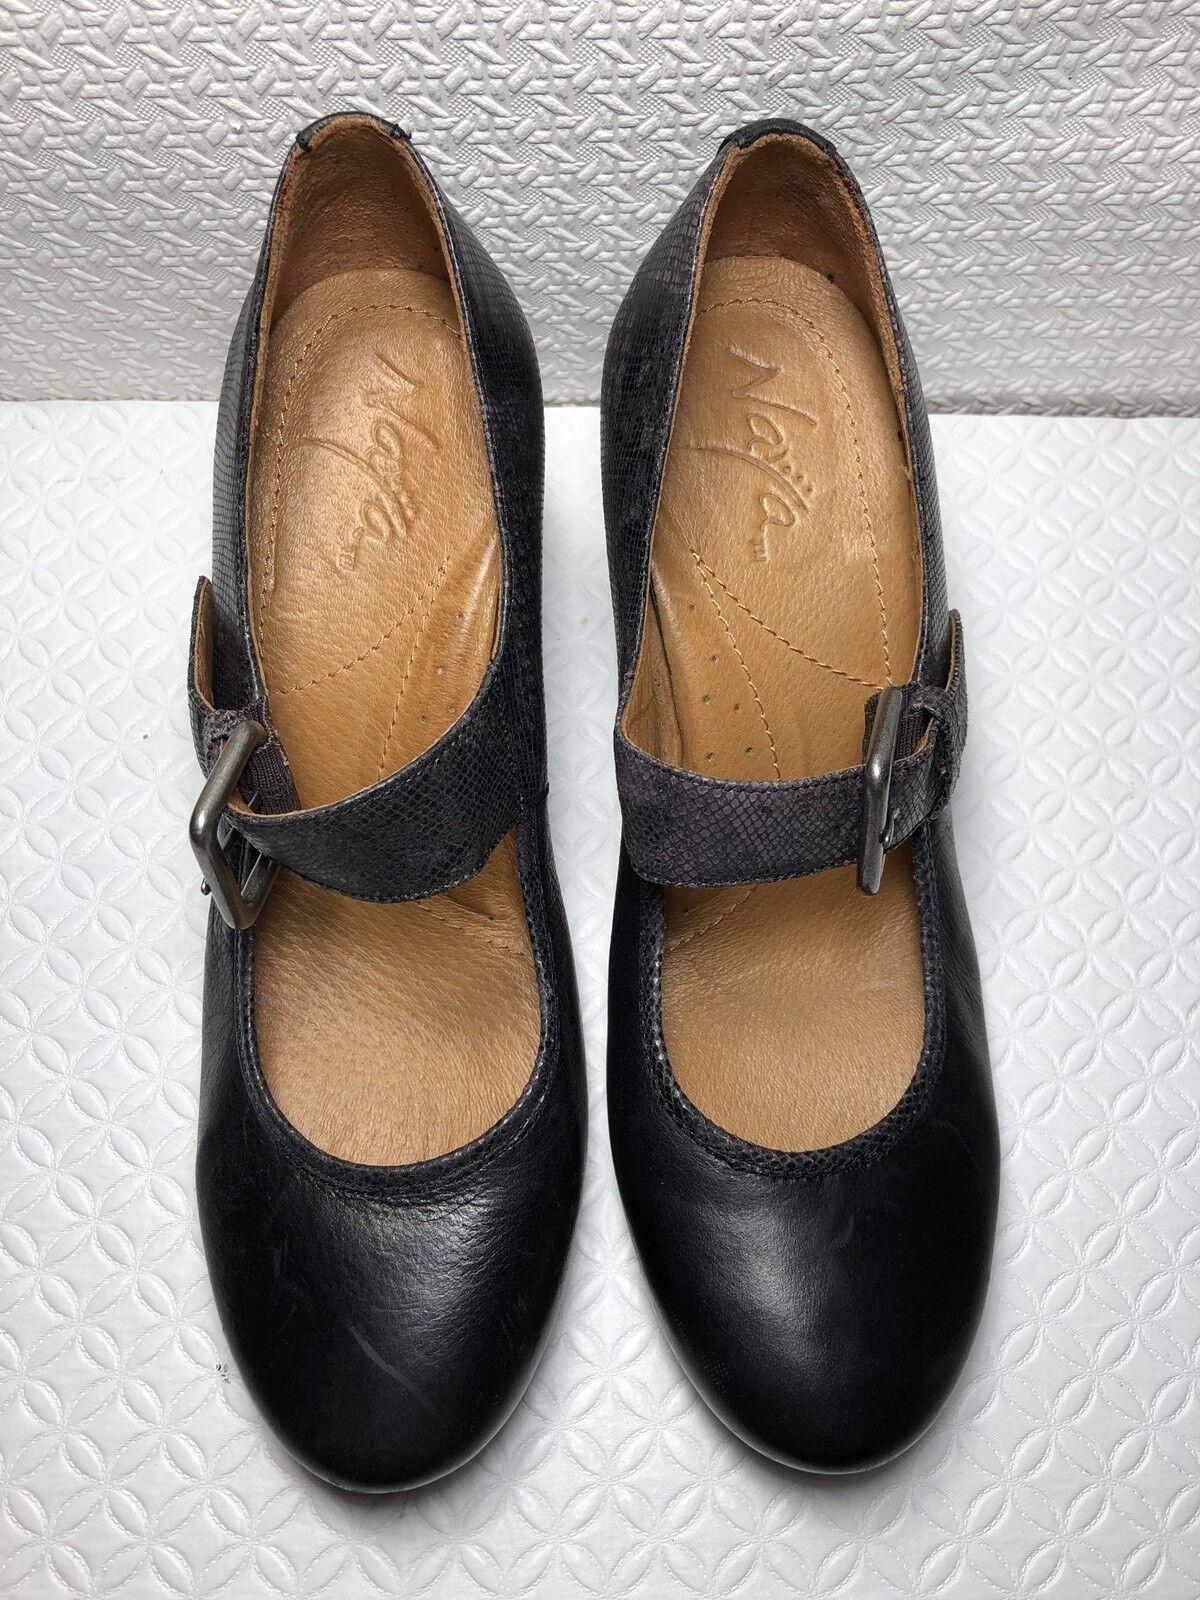 Naya jacinia femmes noir Cuir Plate-forme à Enfiler Mary Jane Taille - 8.5 M